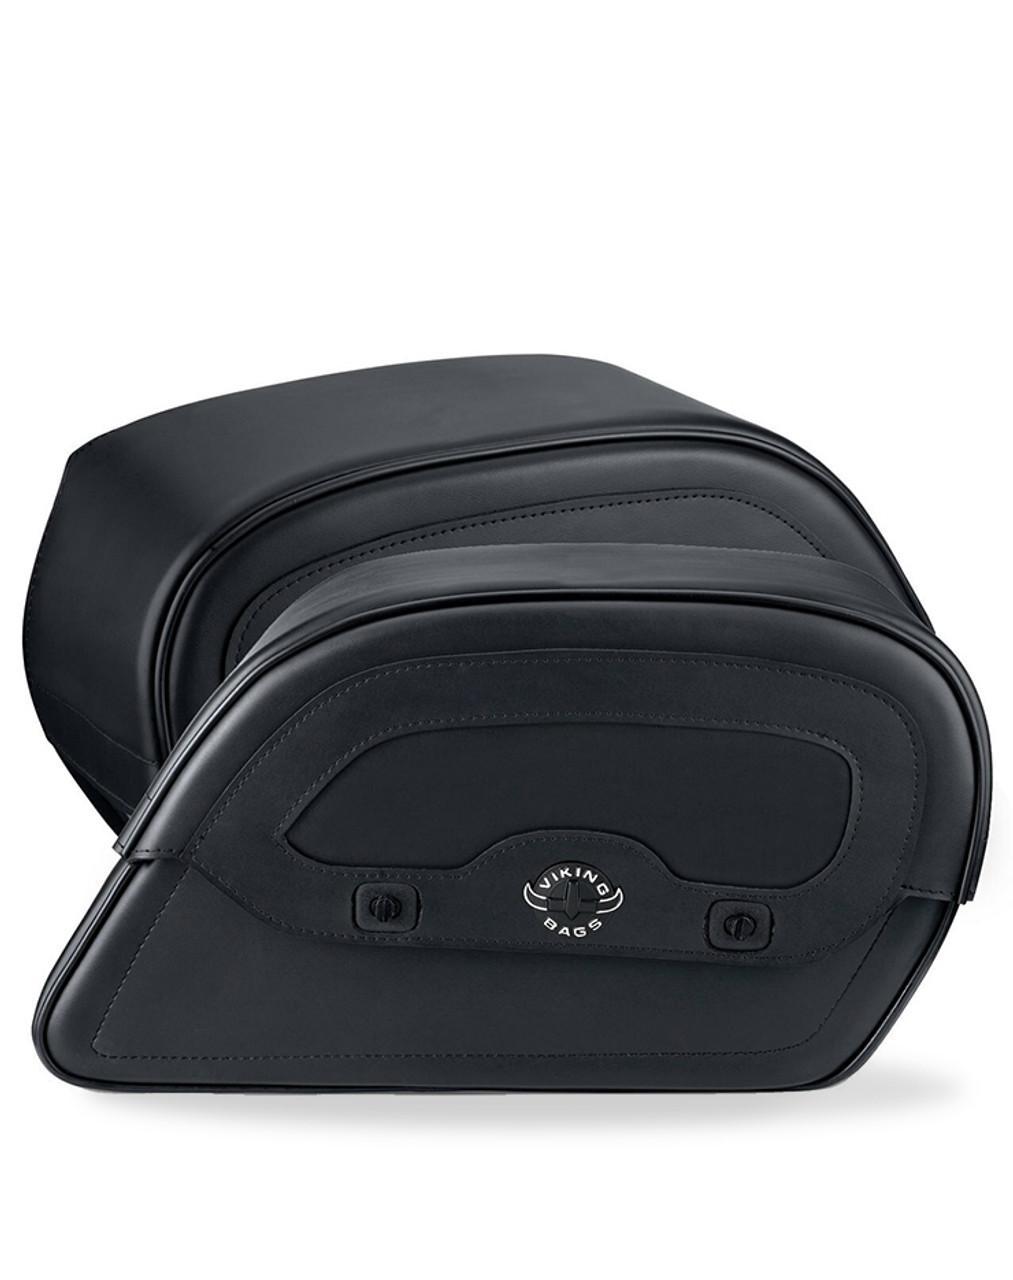 Honda 1500 Valkyrie Standard Uni Warrior Slanted L Motorcycle saddlebags Both Bags View